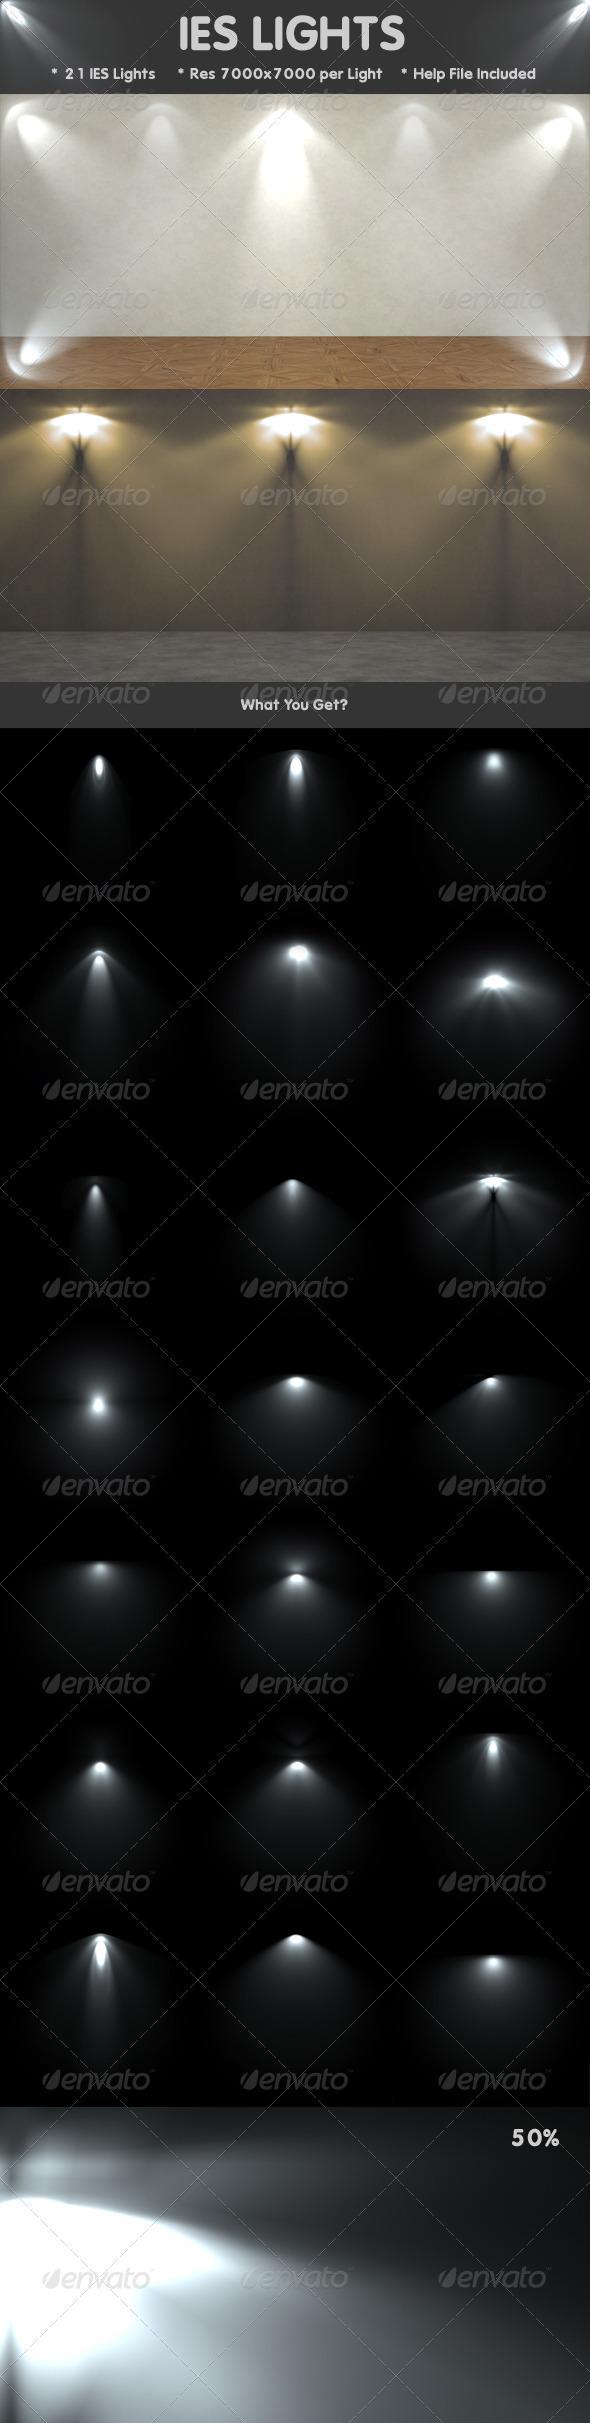 IES Lights